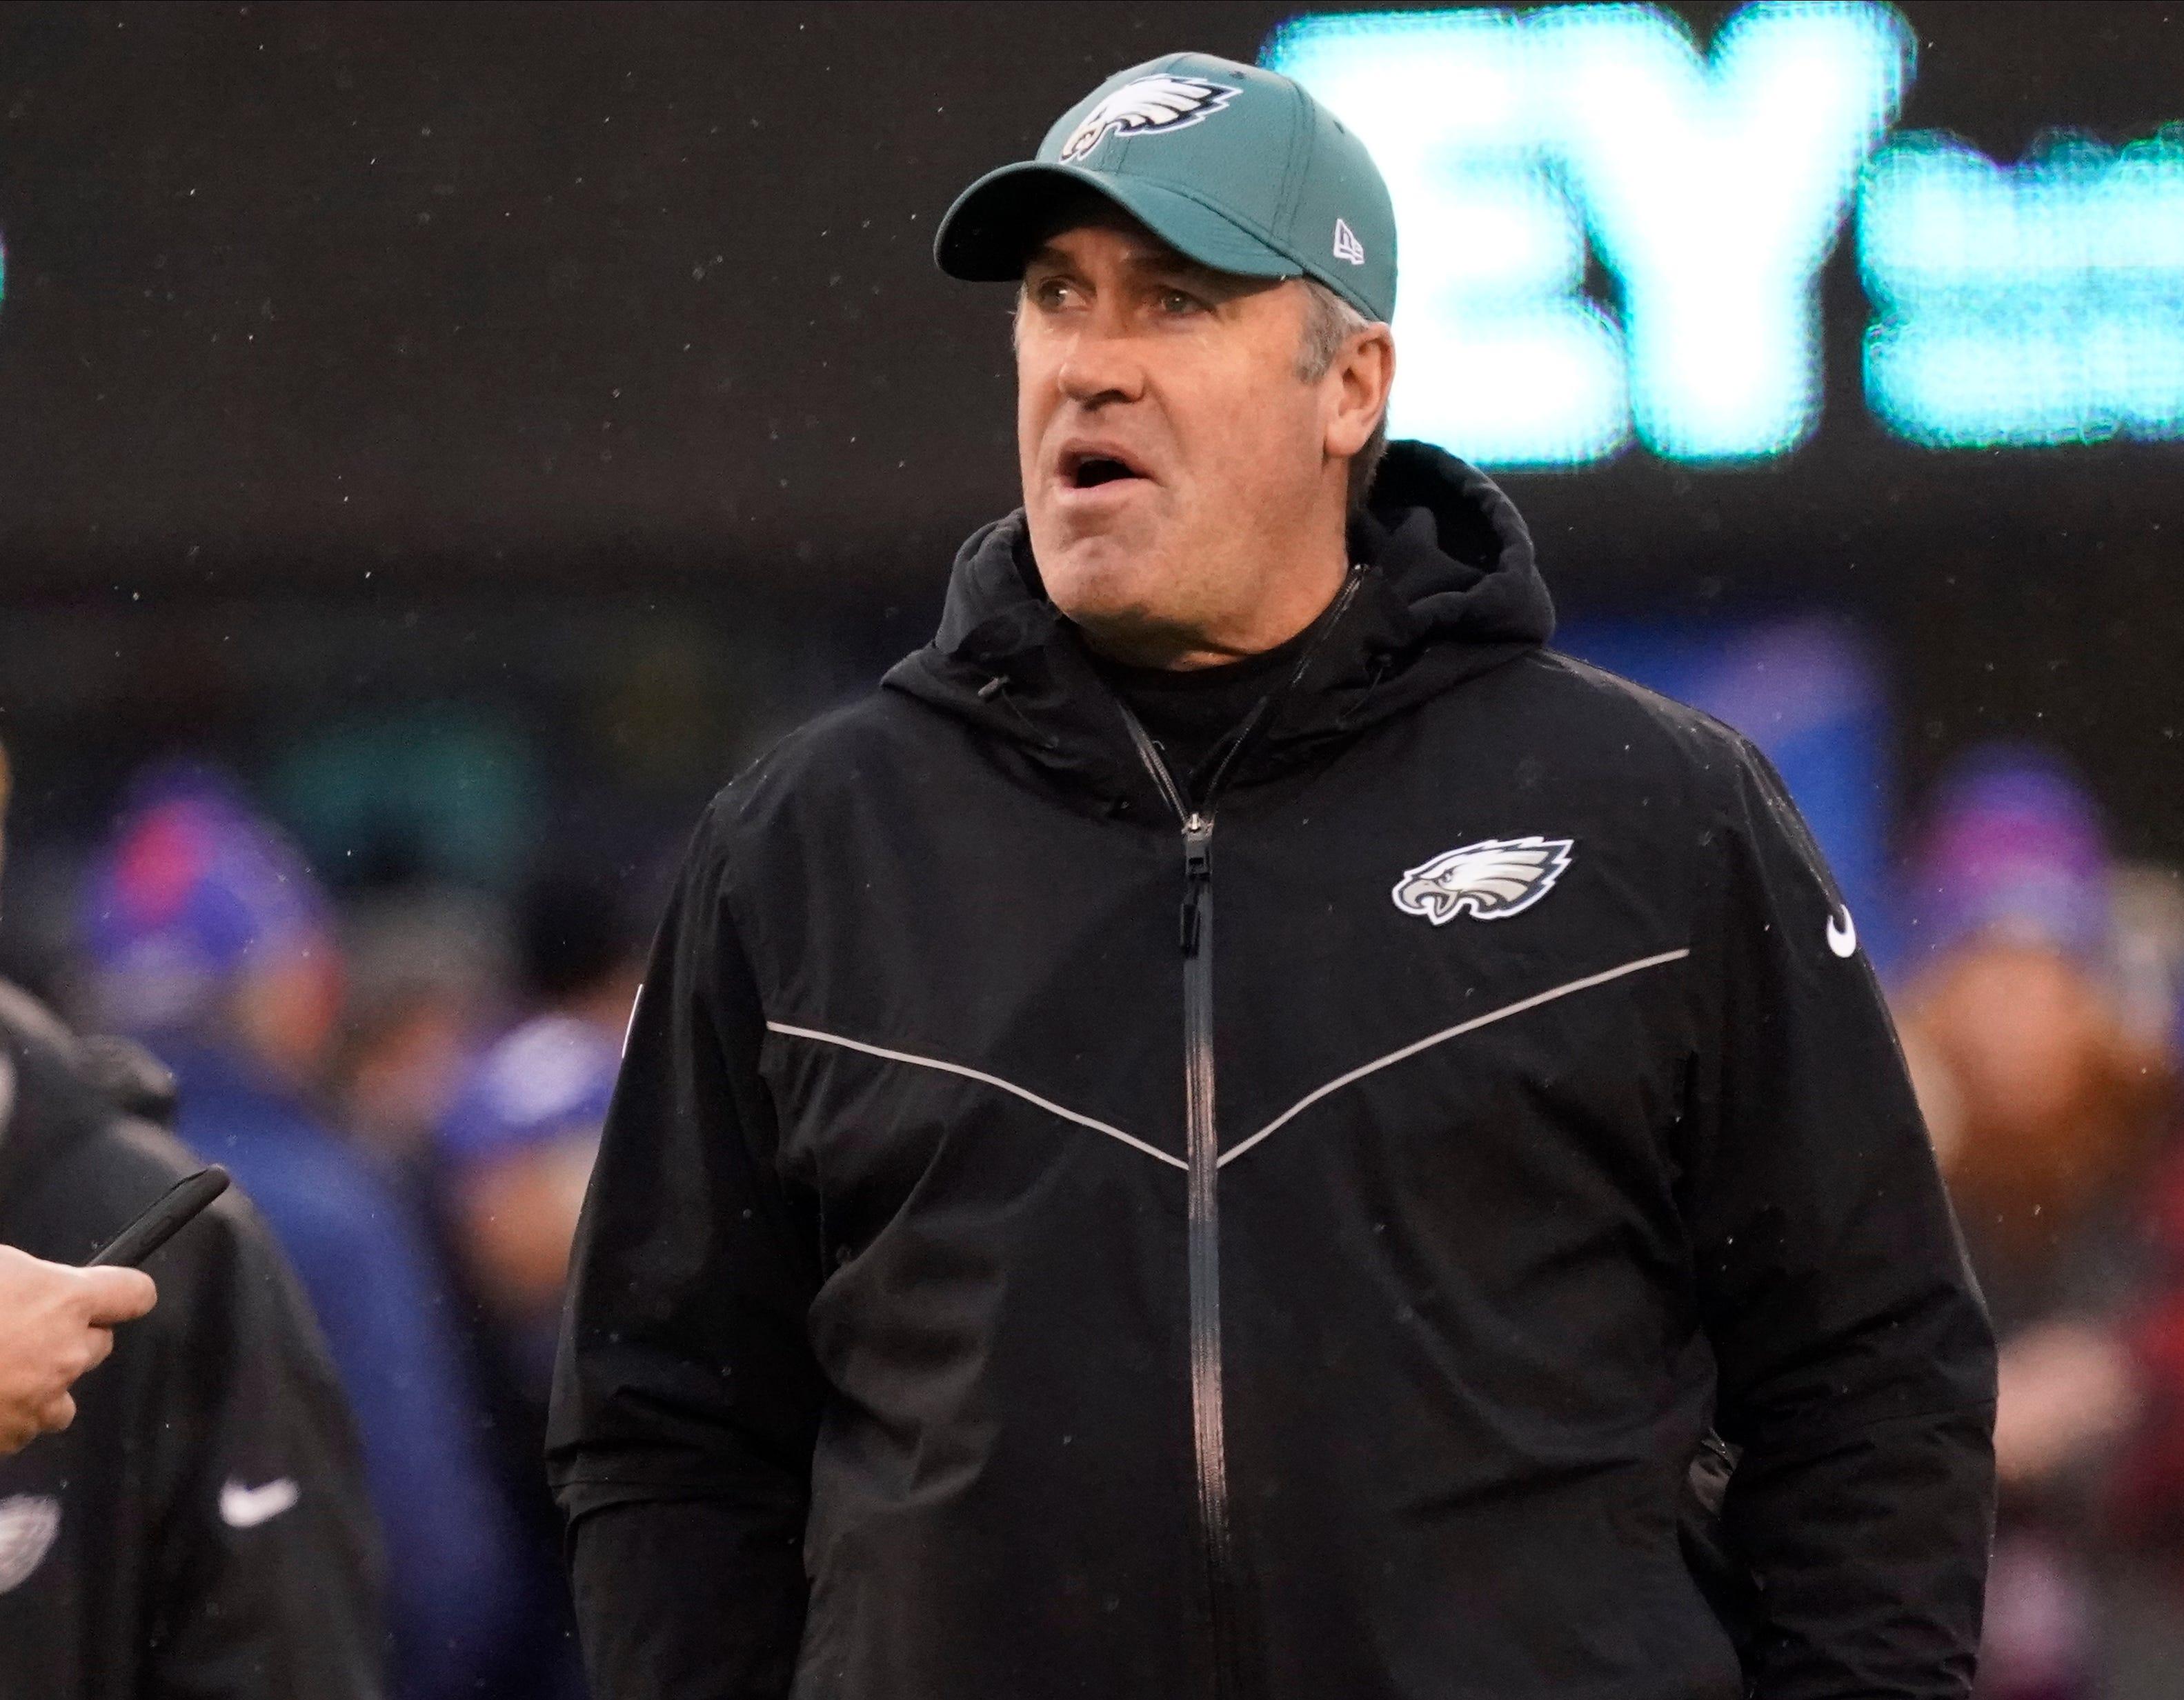 Philadelphia Eagles head coach Doug Pederson tests positive for COVID-19